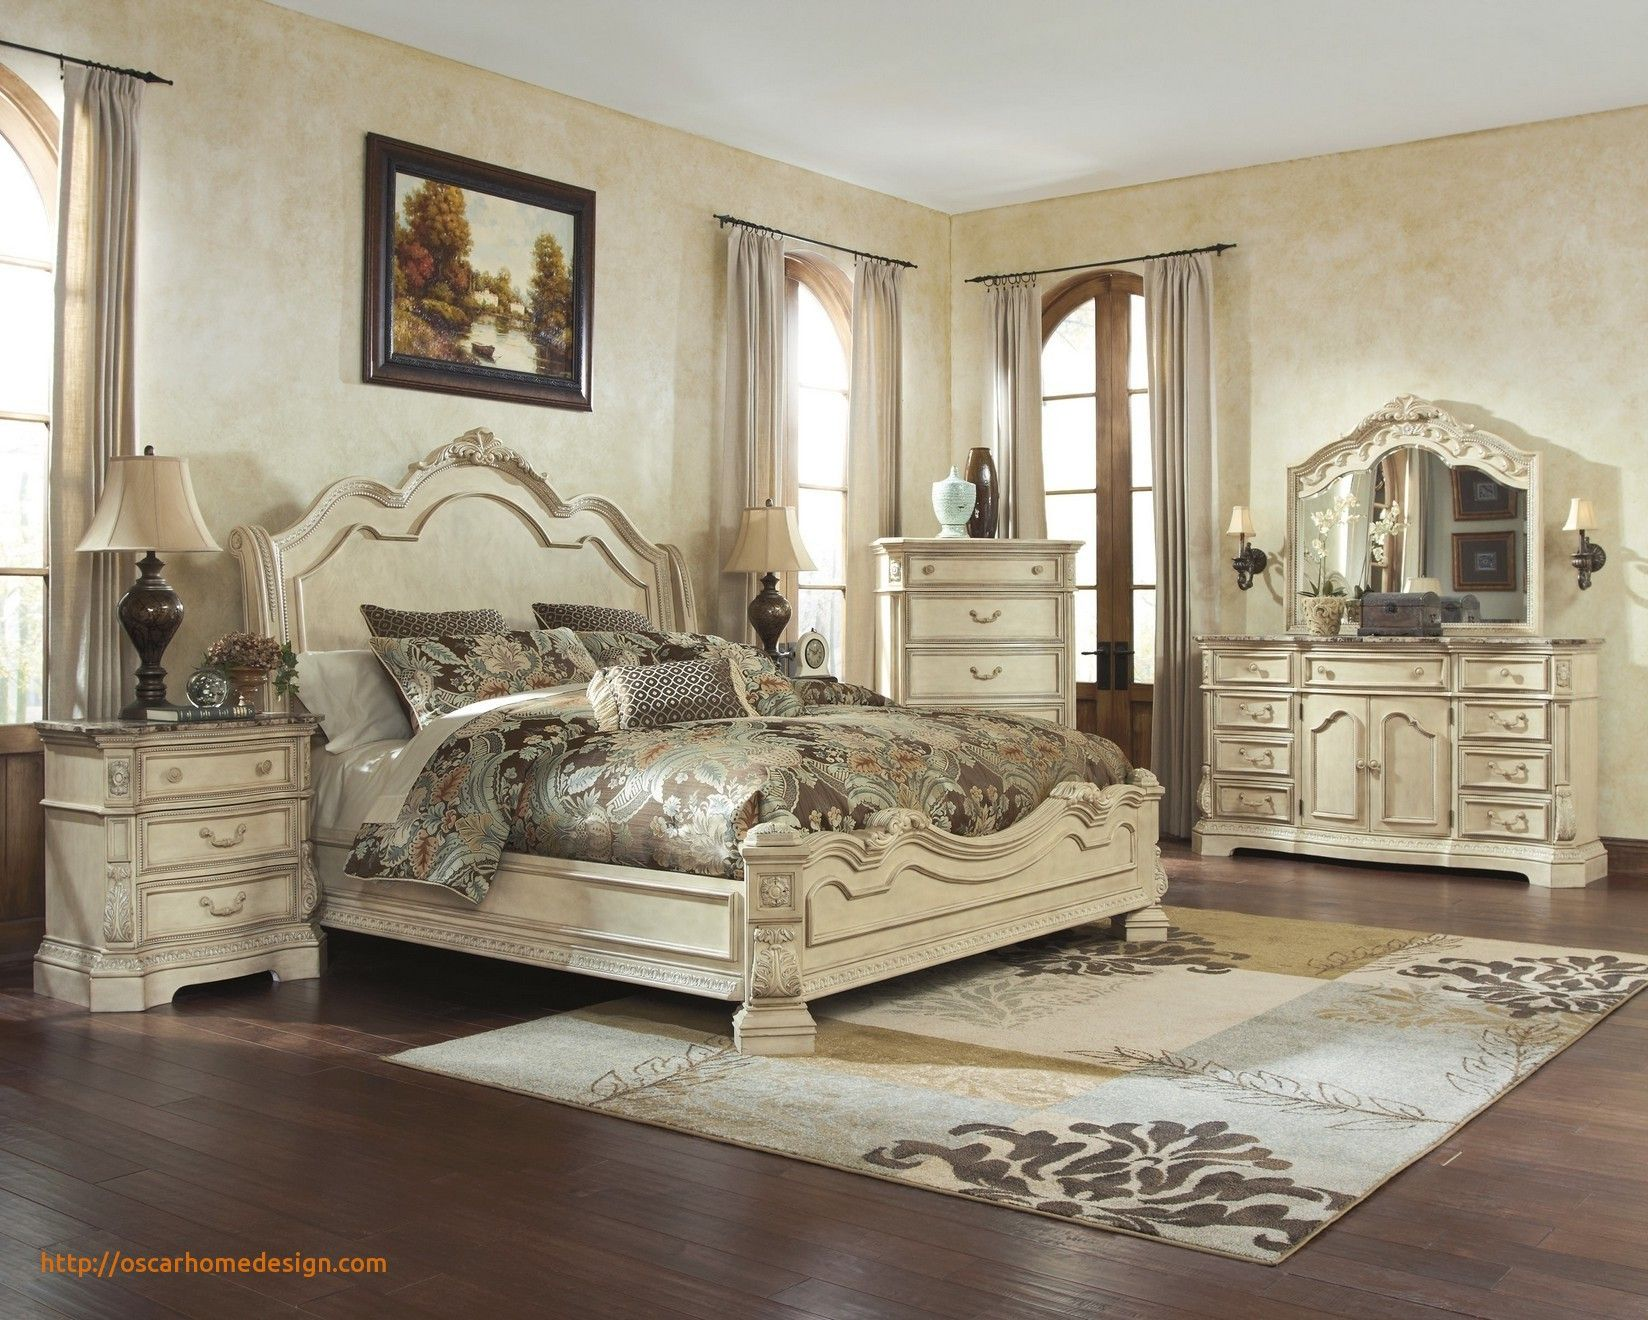 Beautiful Rustic Bedroom Ideas Distressed white bedroom